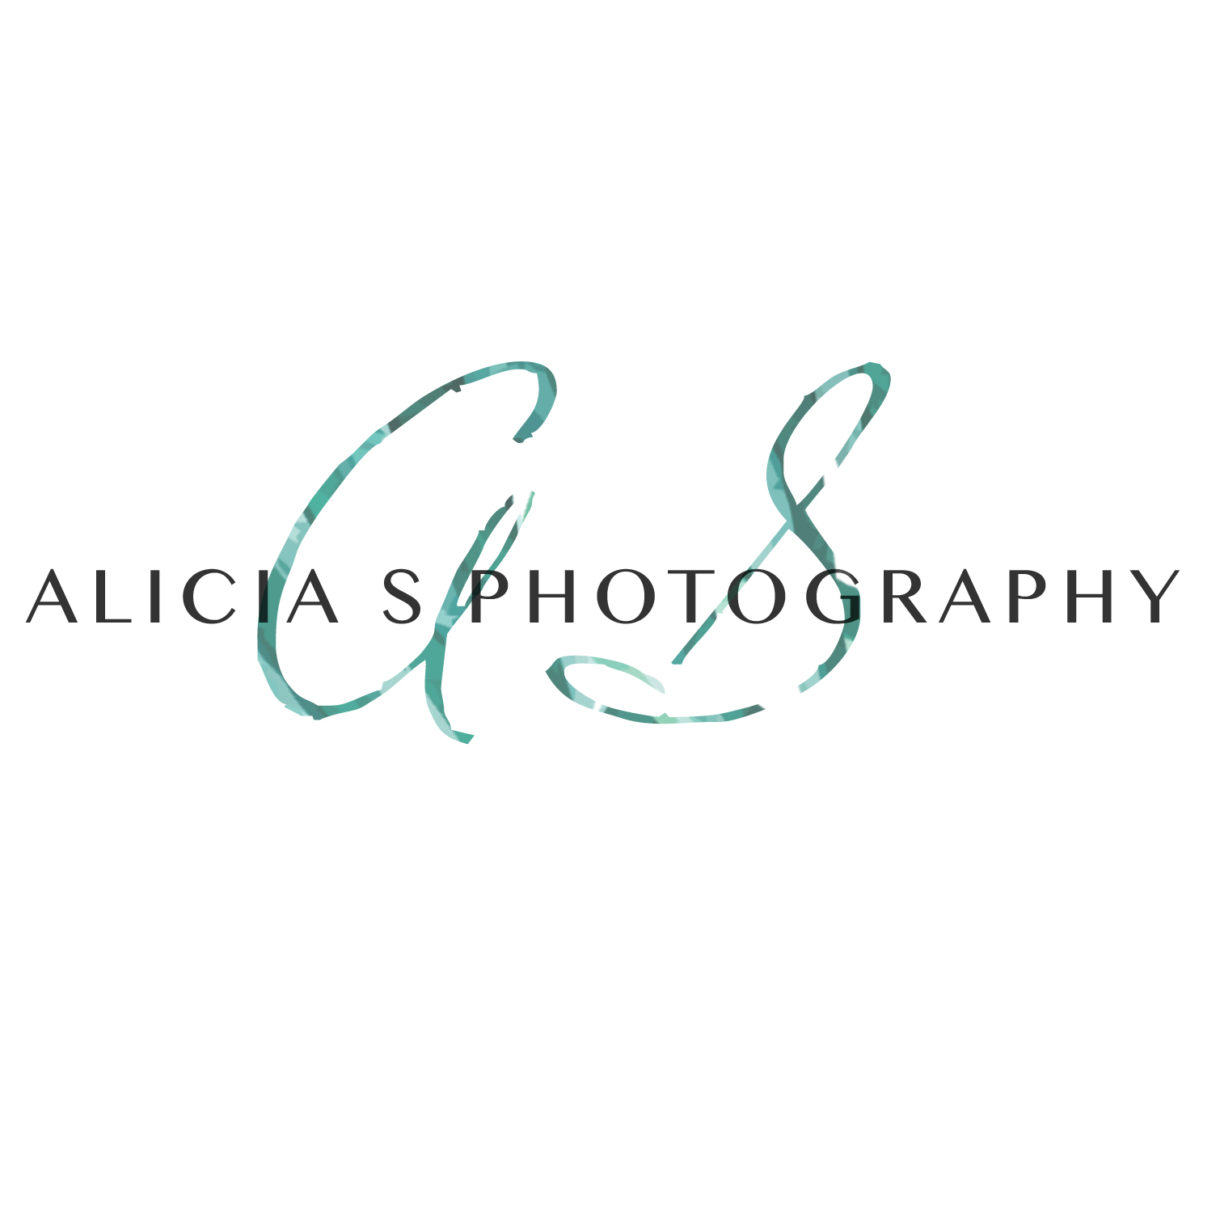 Alicia S Photography